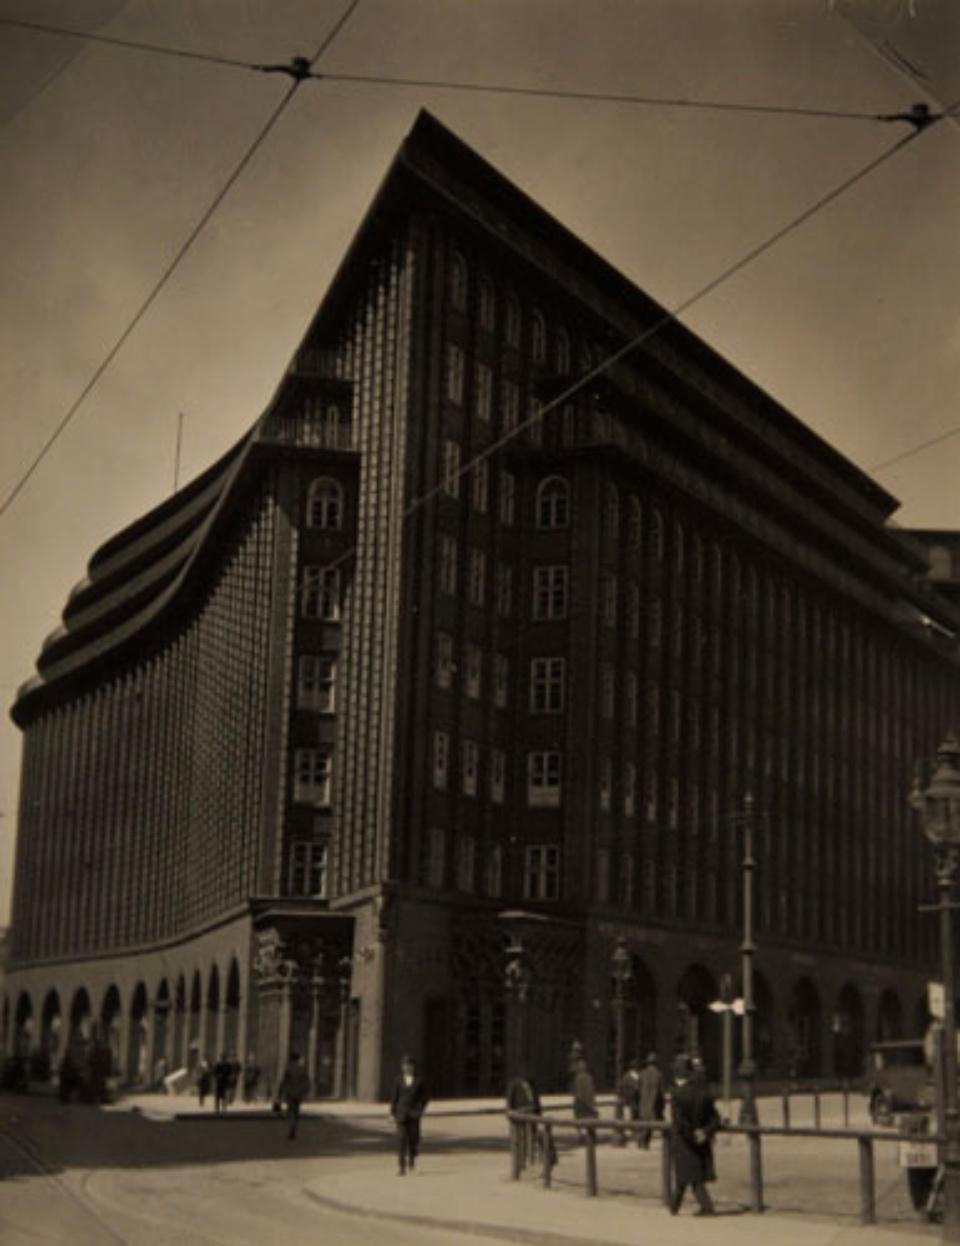 E.O. Hoppé Chilehaus, Hamburg, 1925 Vintage gelatin silver print